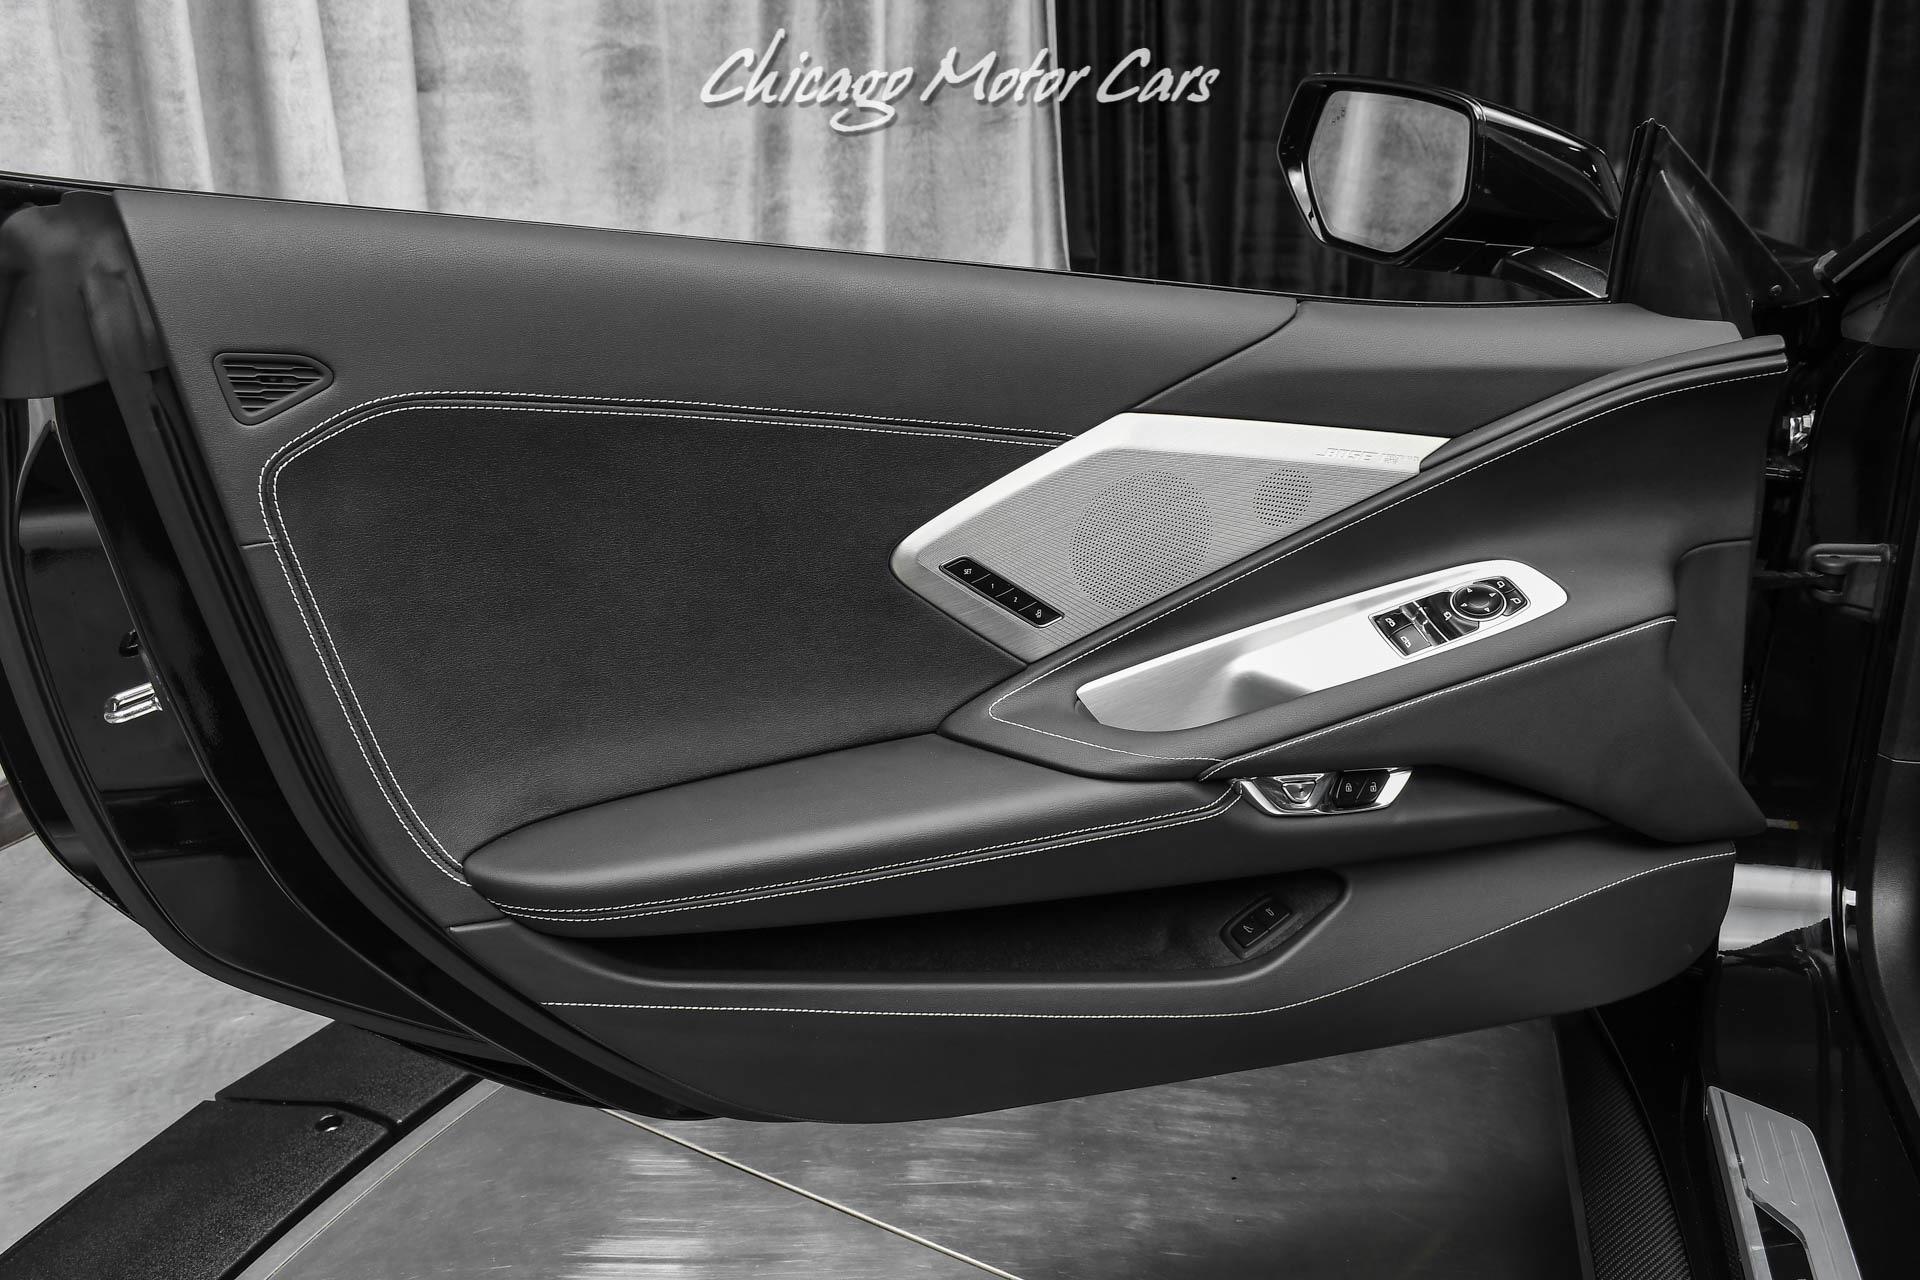 Used-2020-Chevrolet-Corvette-Stingray-Z51-Performance-Package-2LT-Package-Brixton-Wheels